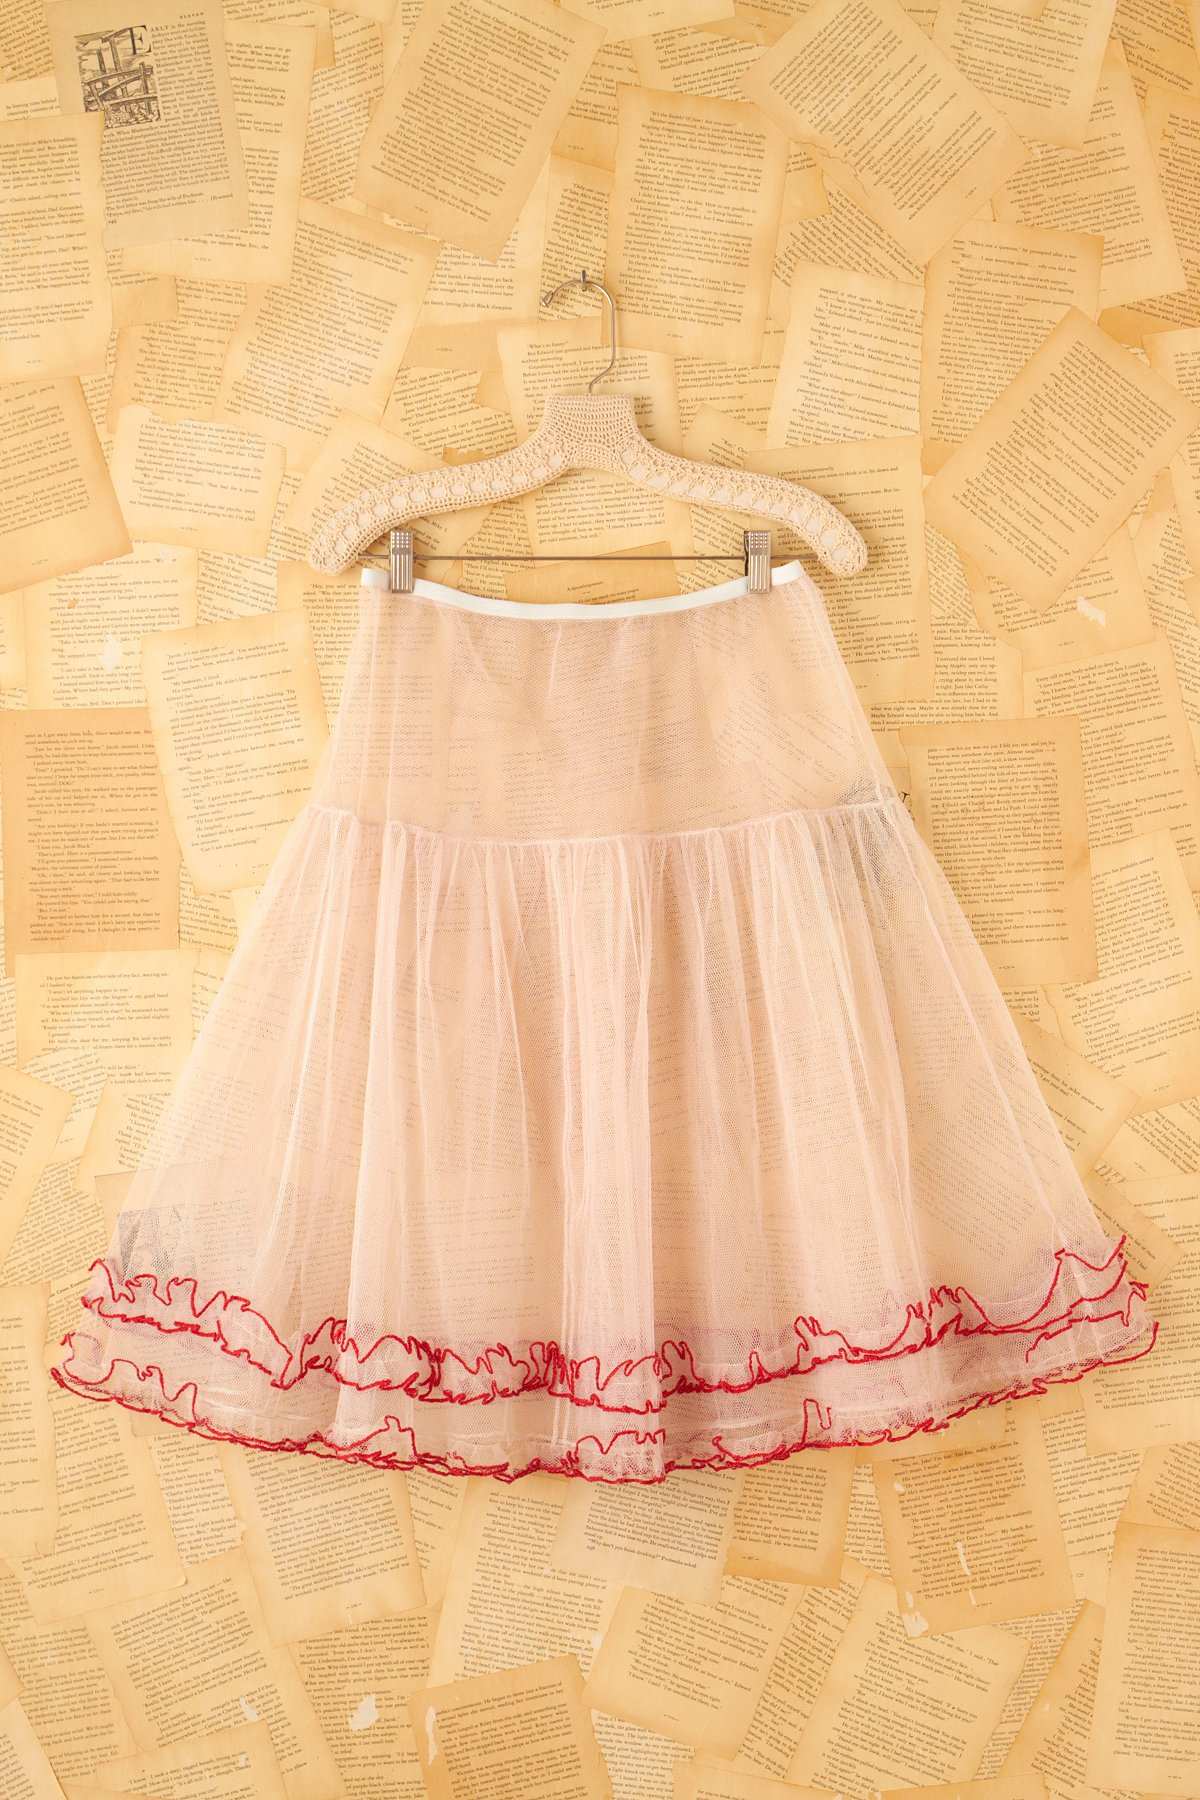 Vintage Pink Crinoline Skirt with Red Trim